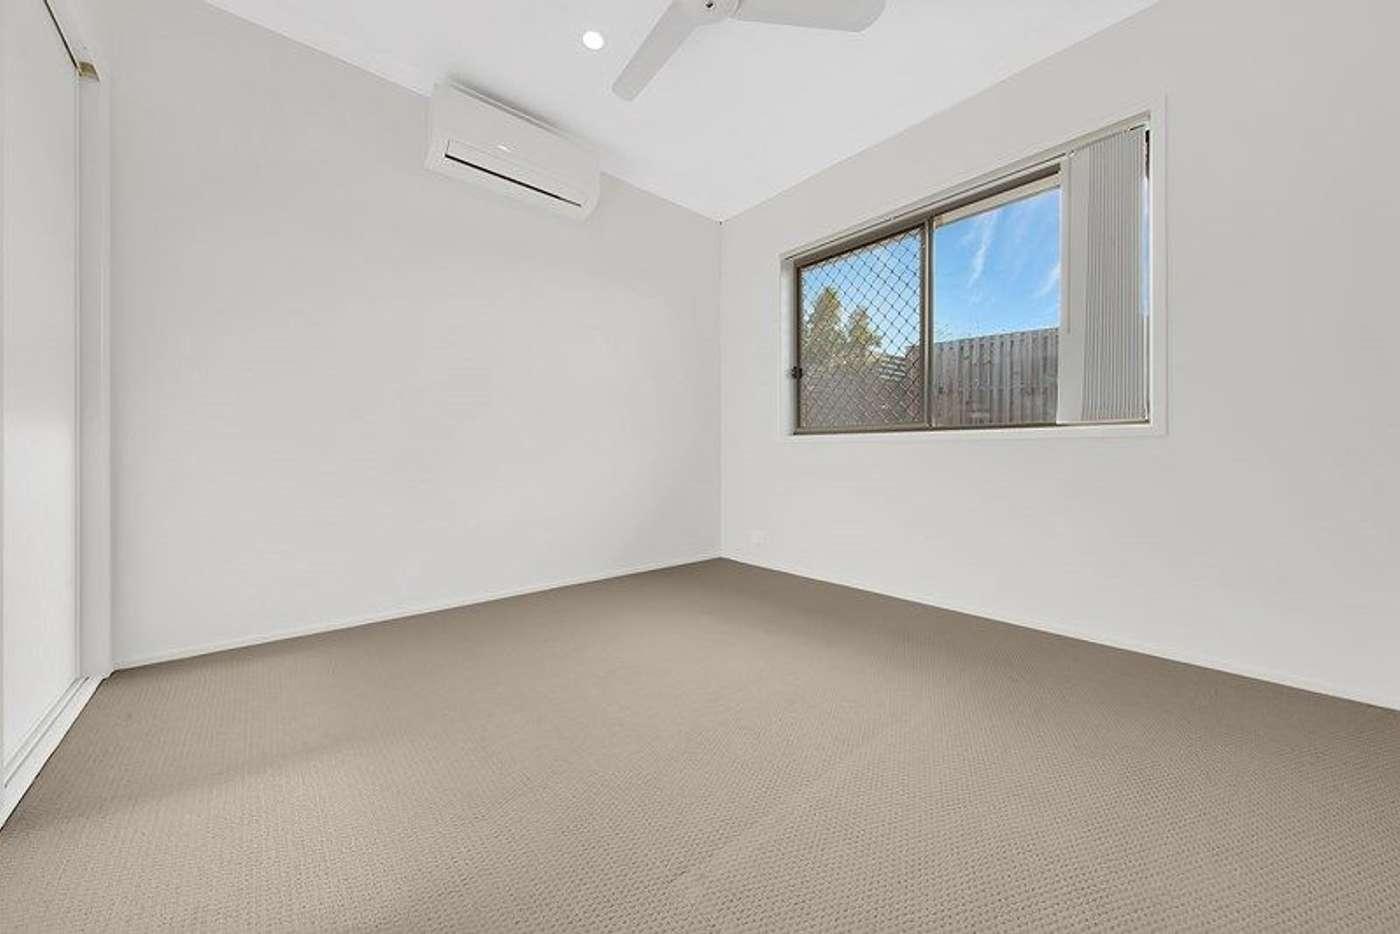 Sixth view of Homely house listing, 4 Josephine Street, Boyne Island QLD 4680